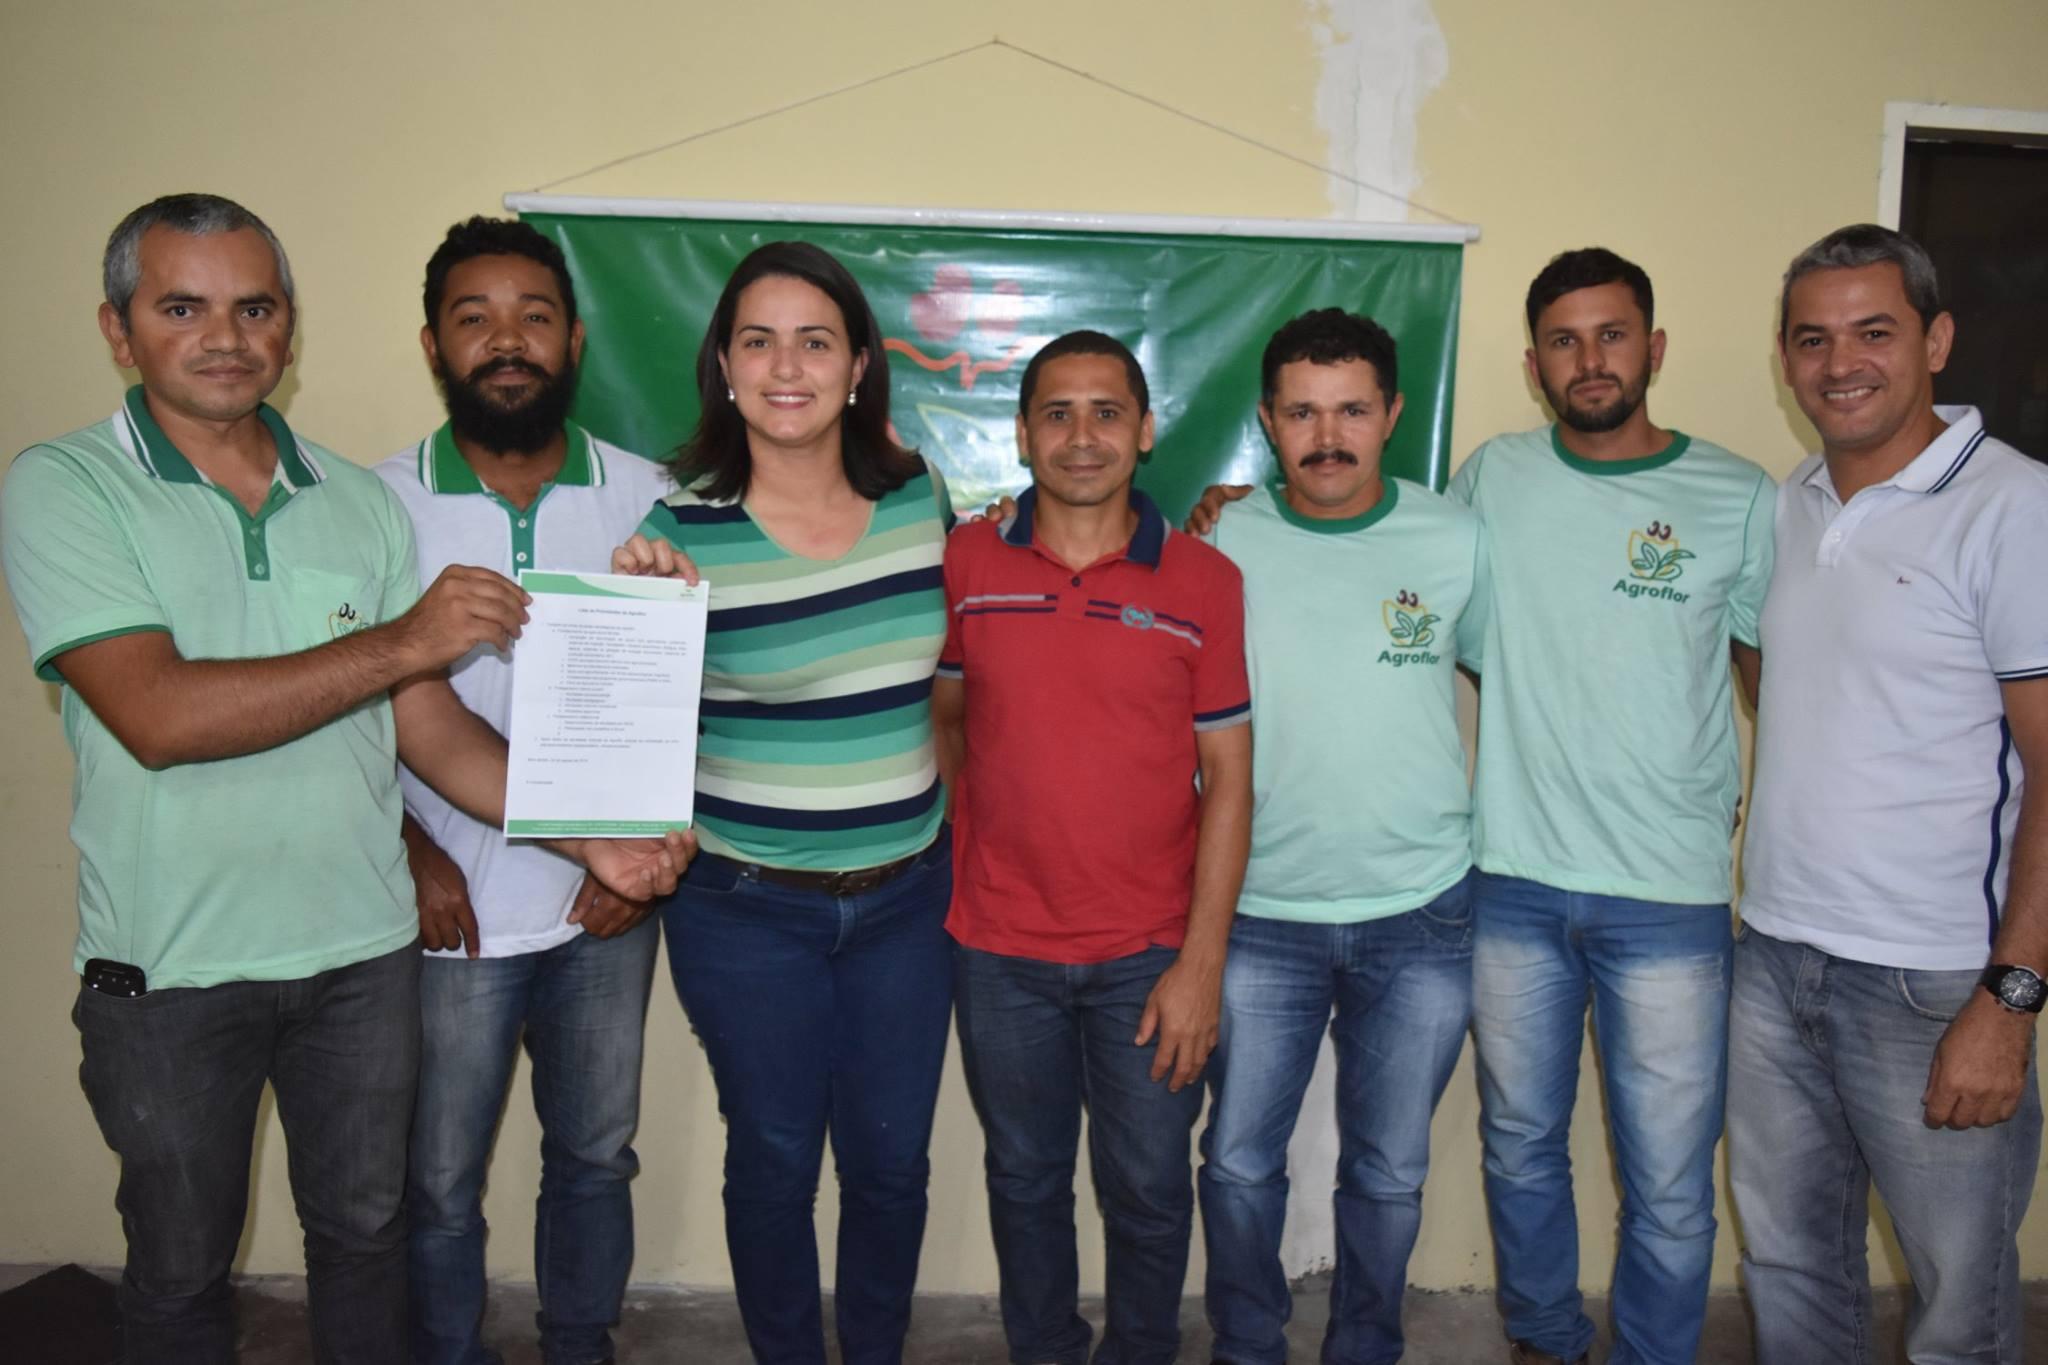 AGROFLOR apresenta pauta para a pré-candidata Juliana Chaparral